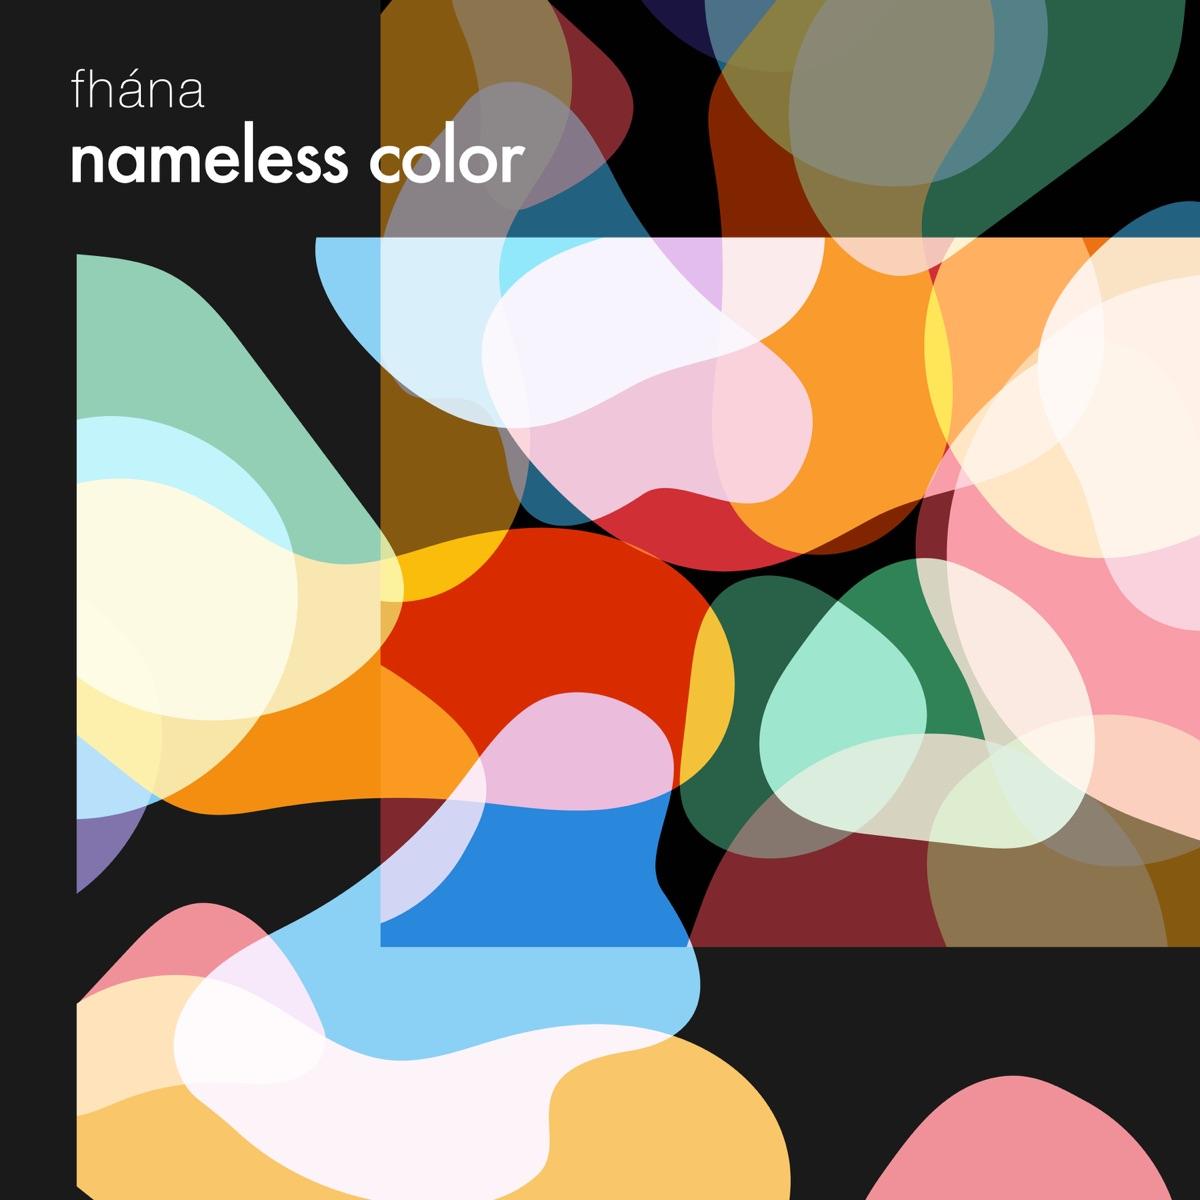 『fhána - nameless color』収録の『nameless color』ジャケット